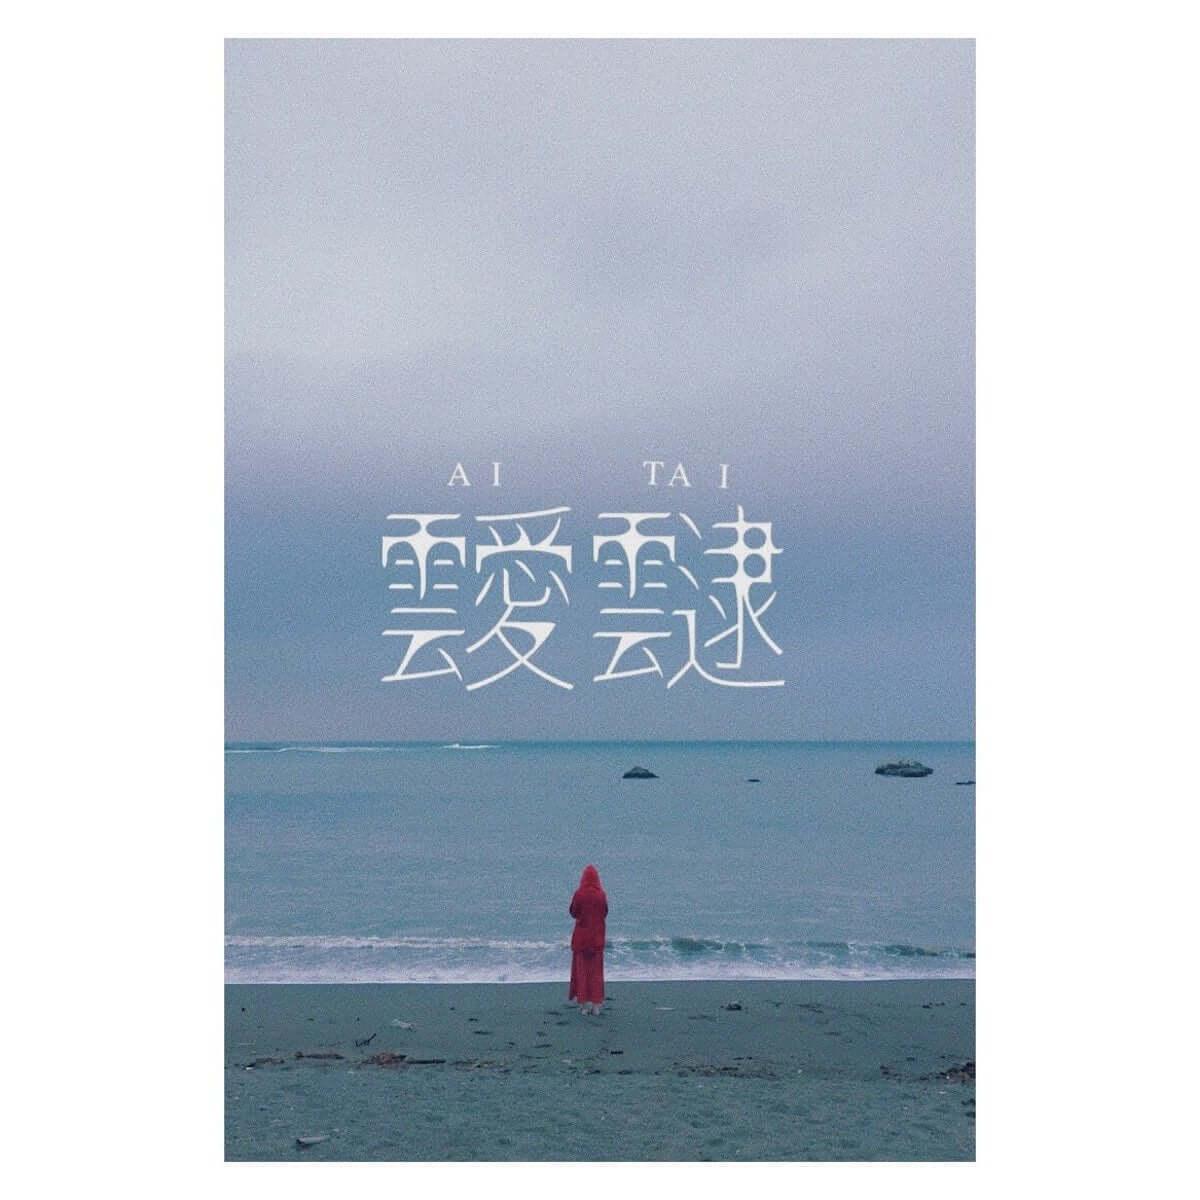 Seihoが新曲「I Feel Tired Everyday」を明日リリース seiho-aitai-190215-1200x1200